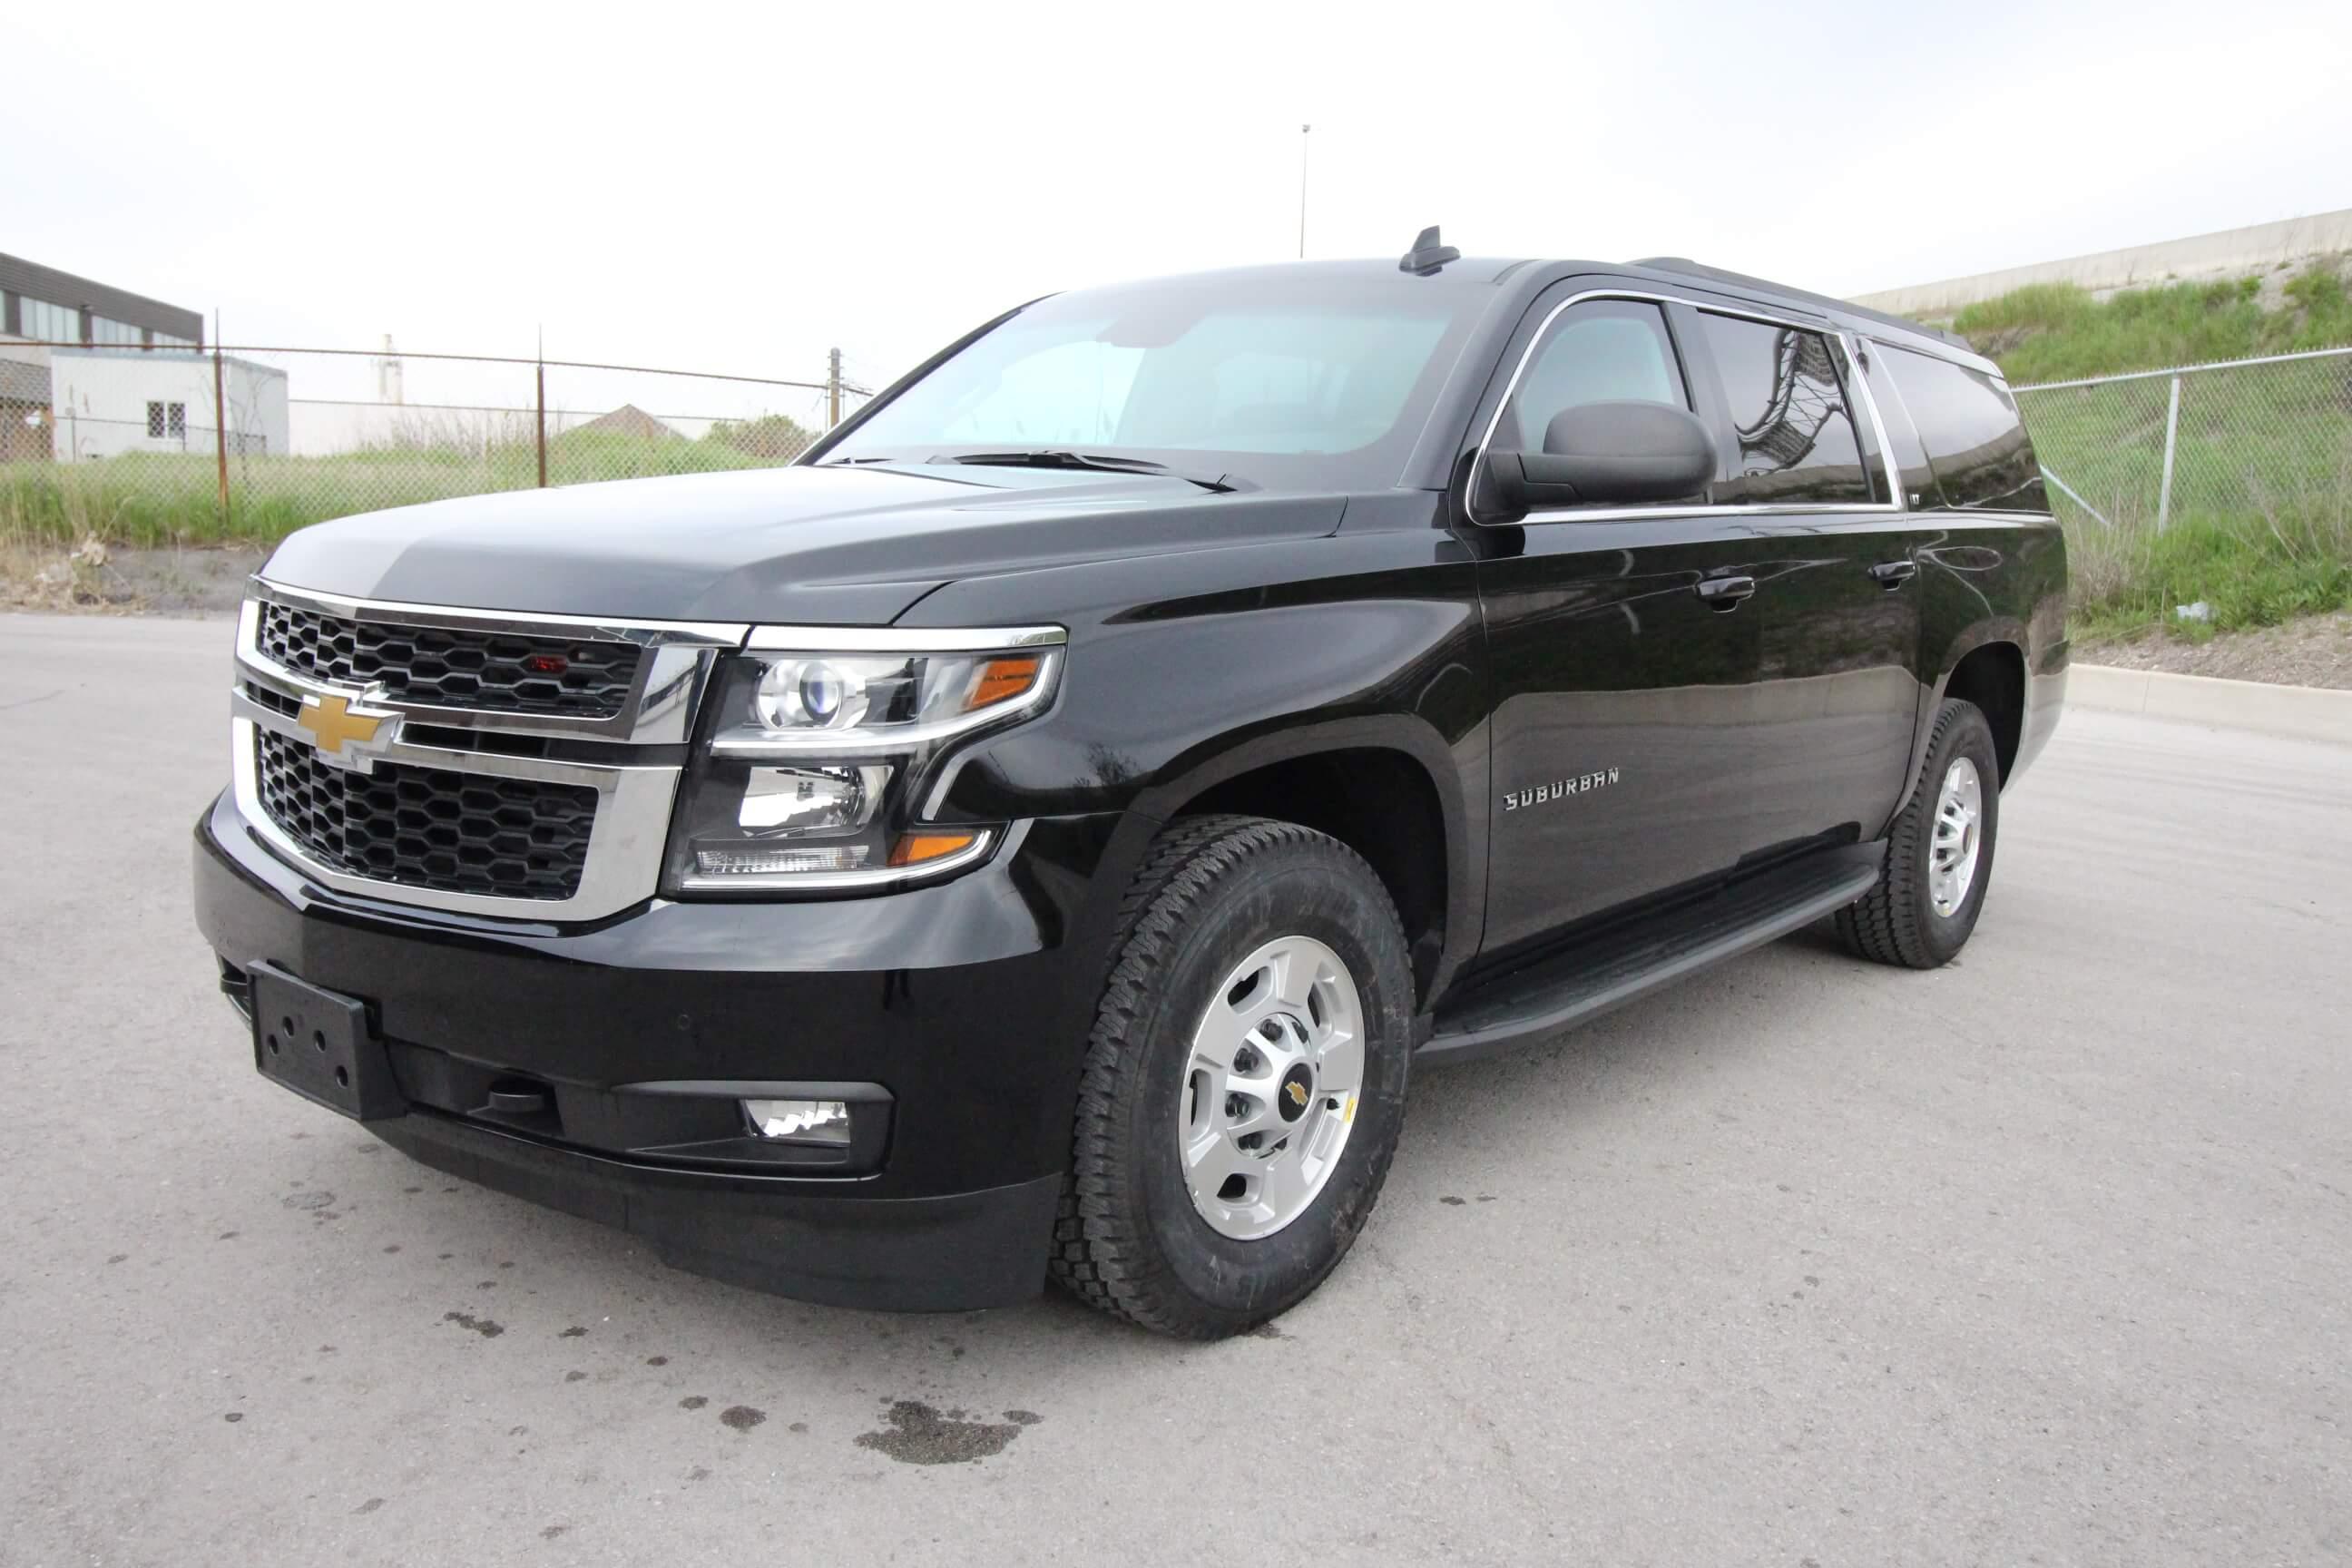 Discrete Armored SWAT Suburban, Bulletproof SUV: The ...